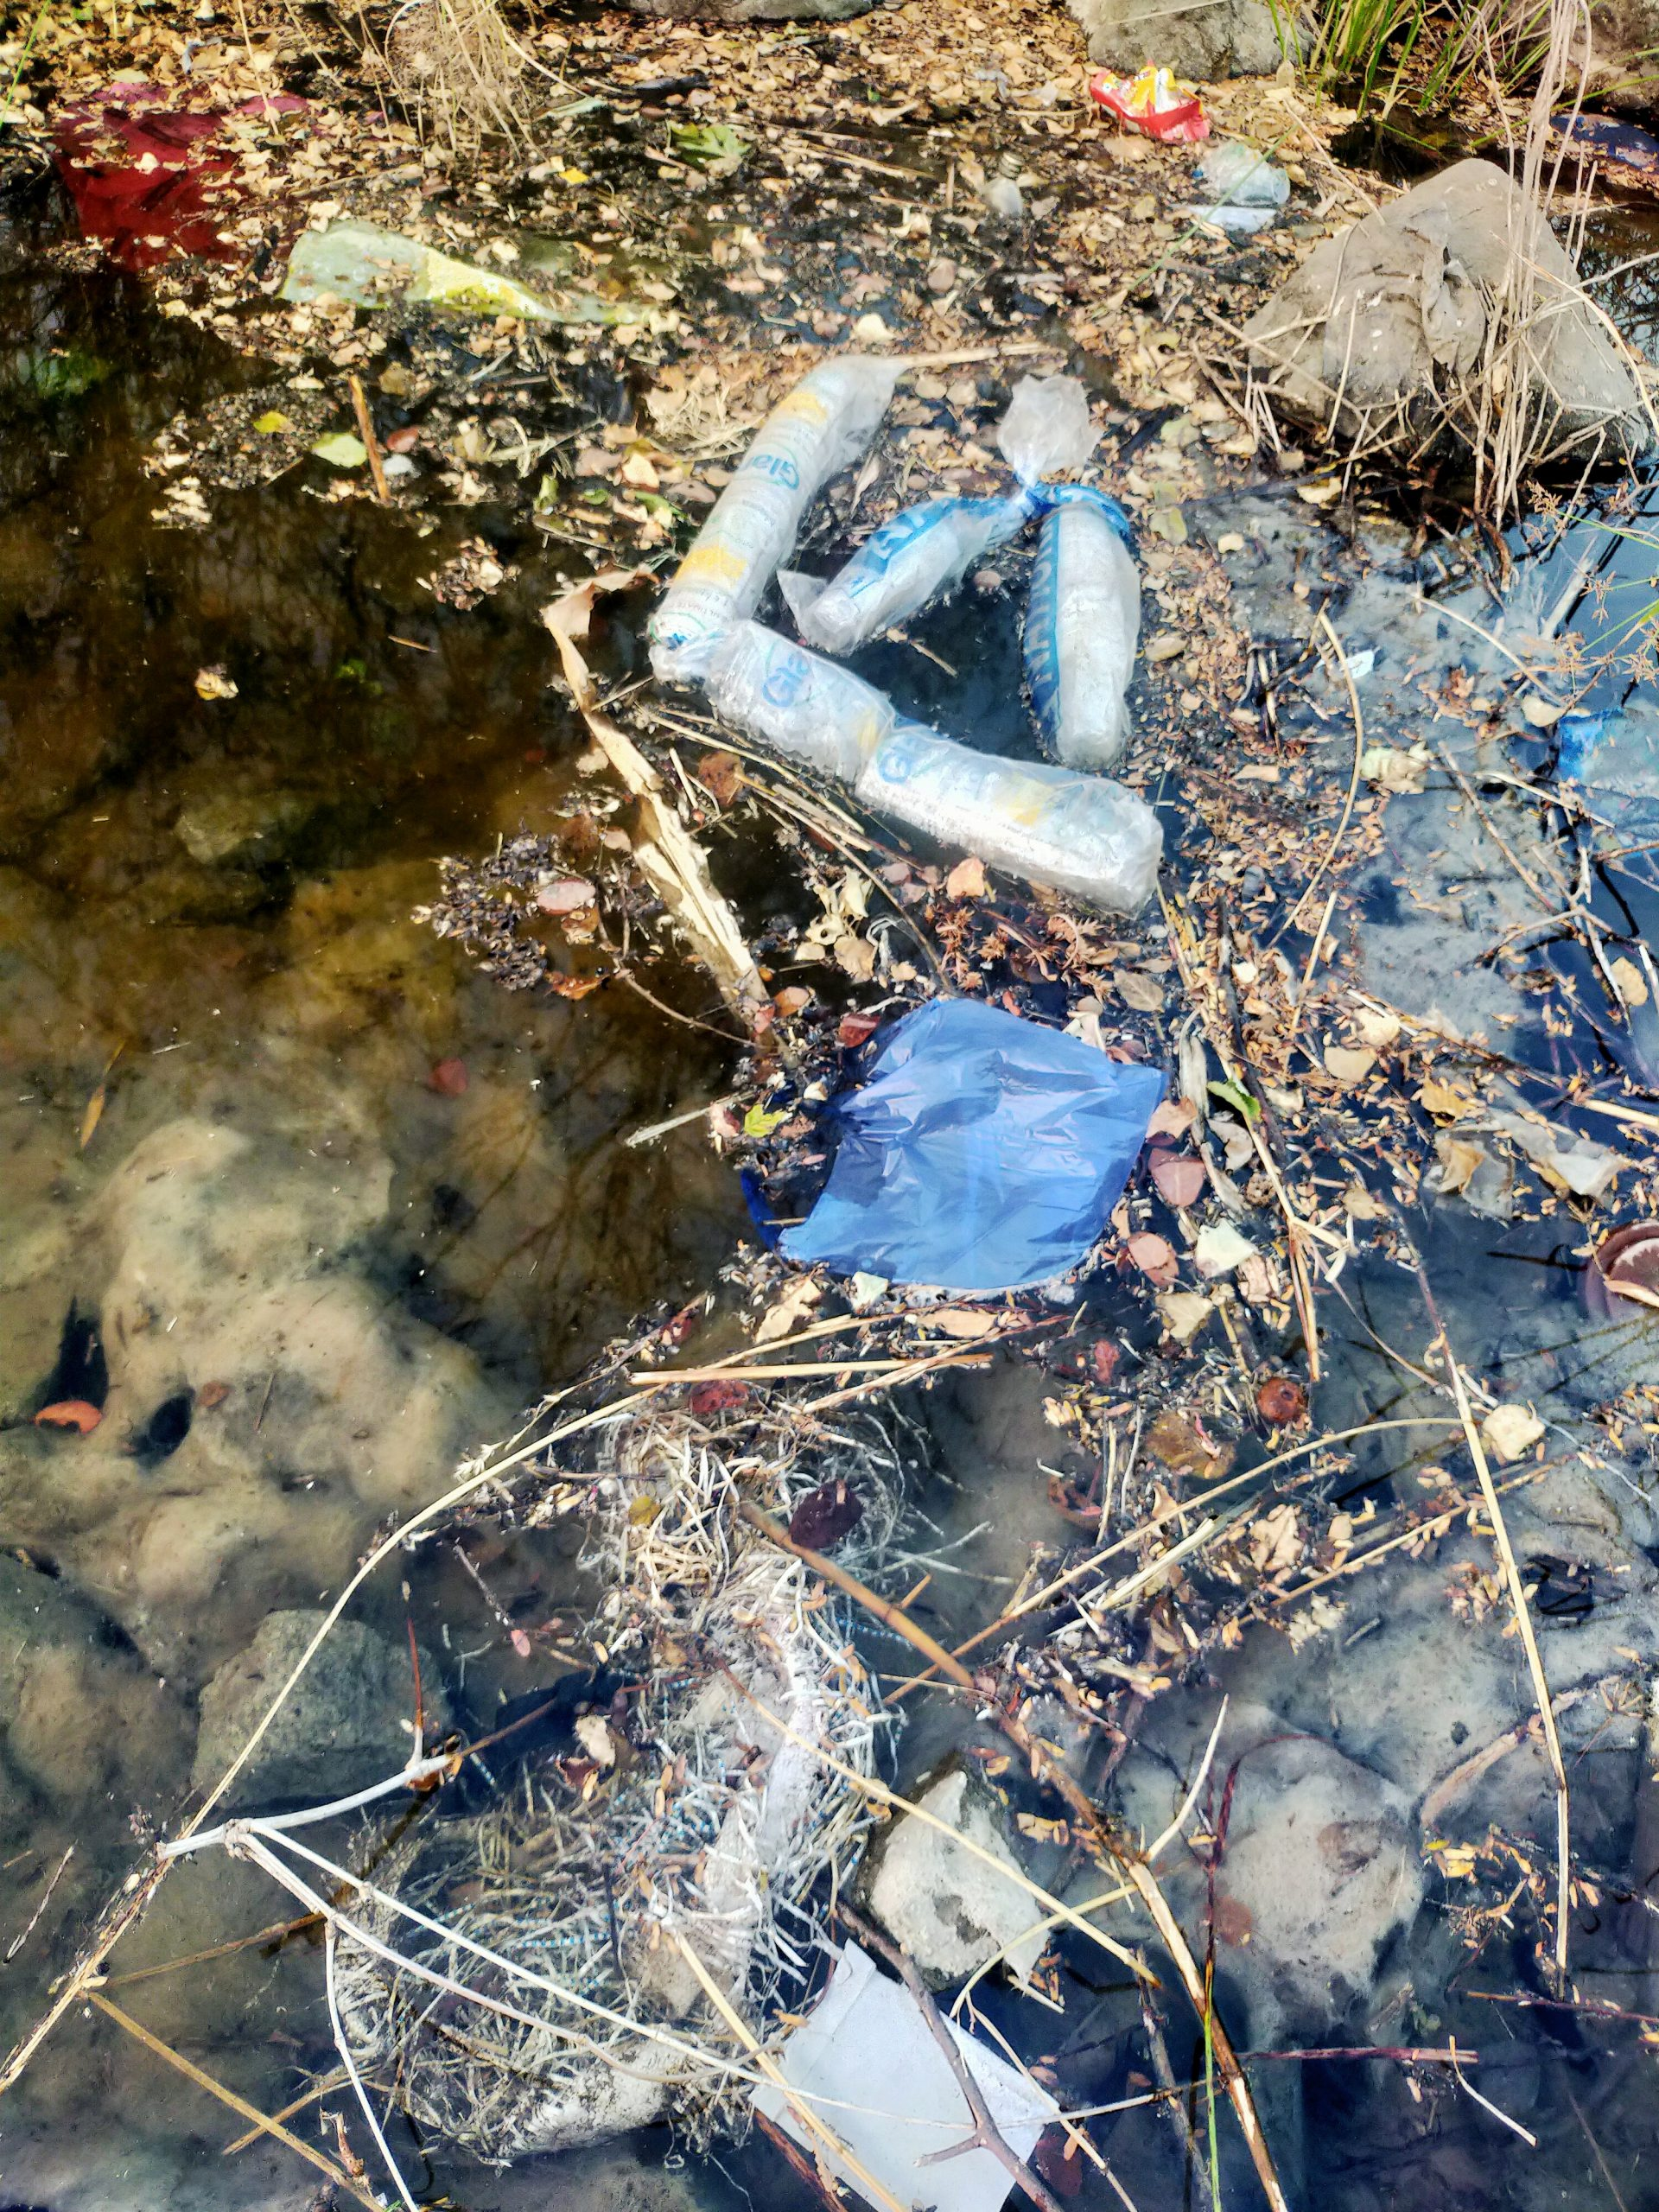 Plastic waste in water